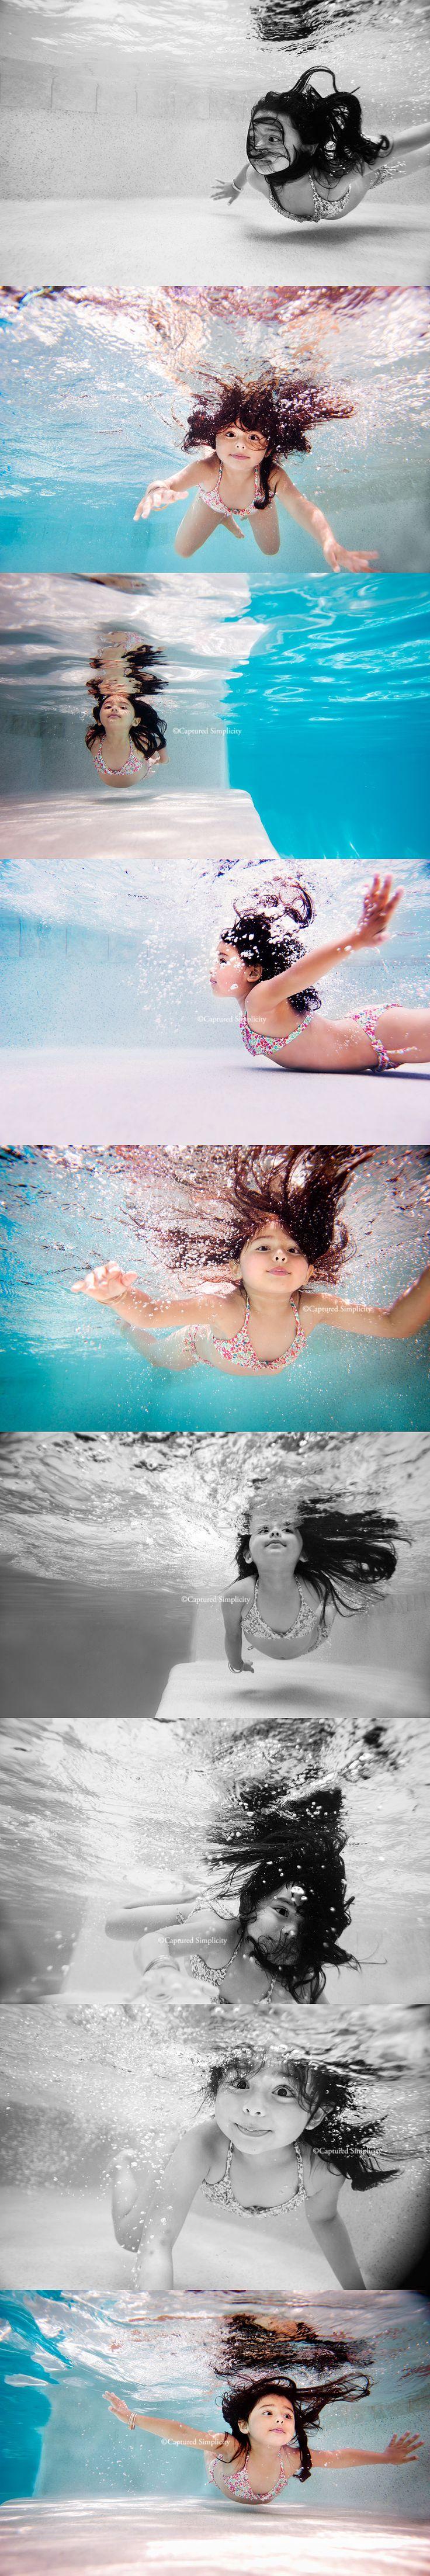 underwater child photographer Houston, Texas photos of children swimming underwater photography